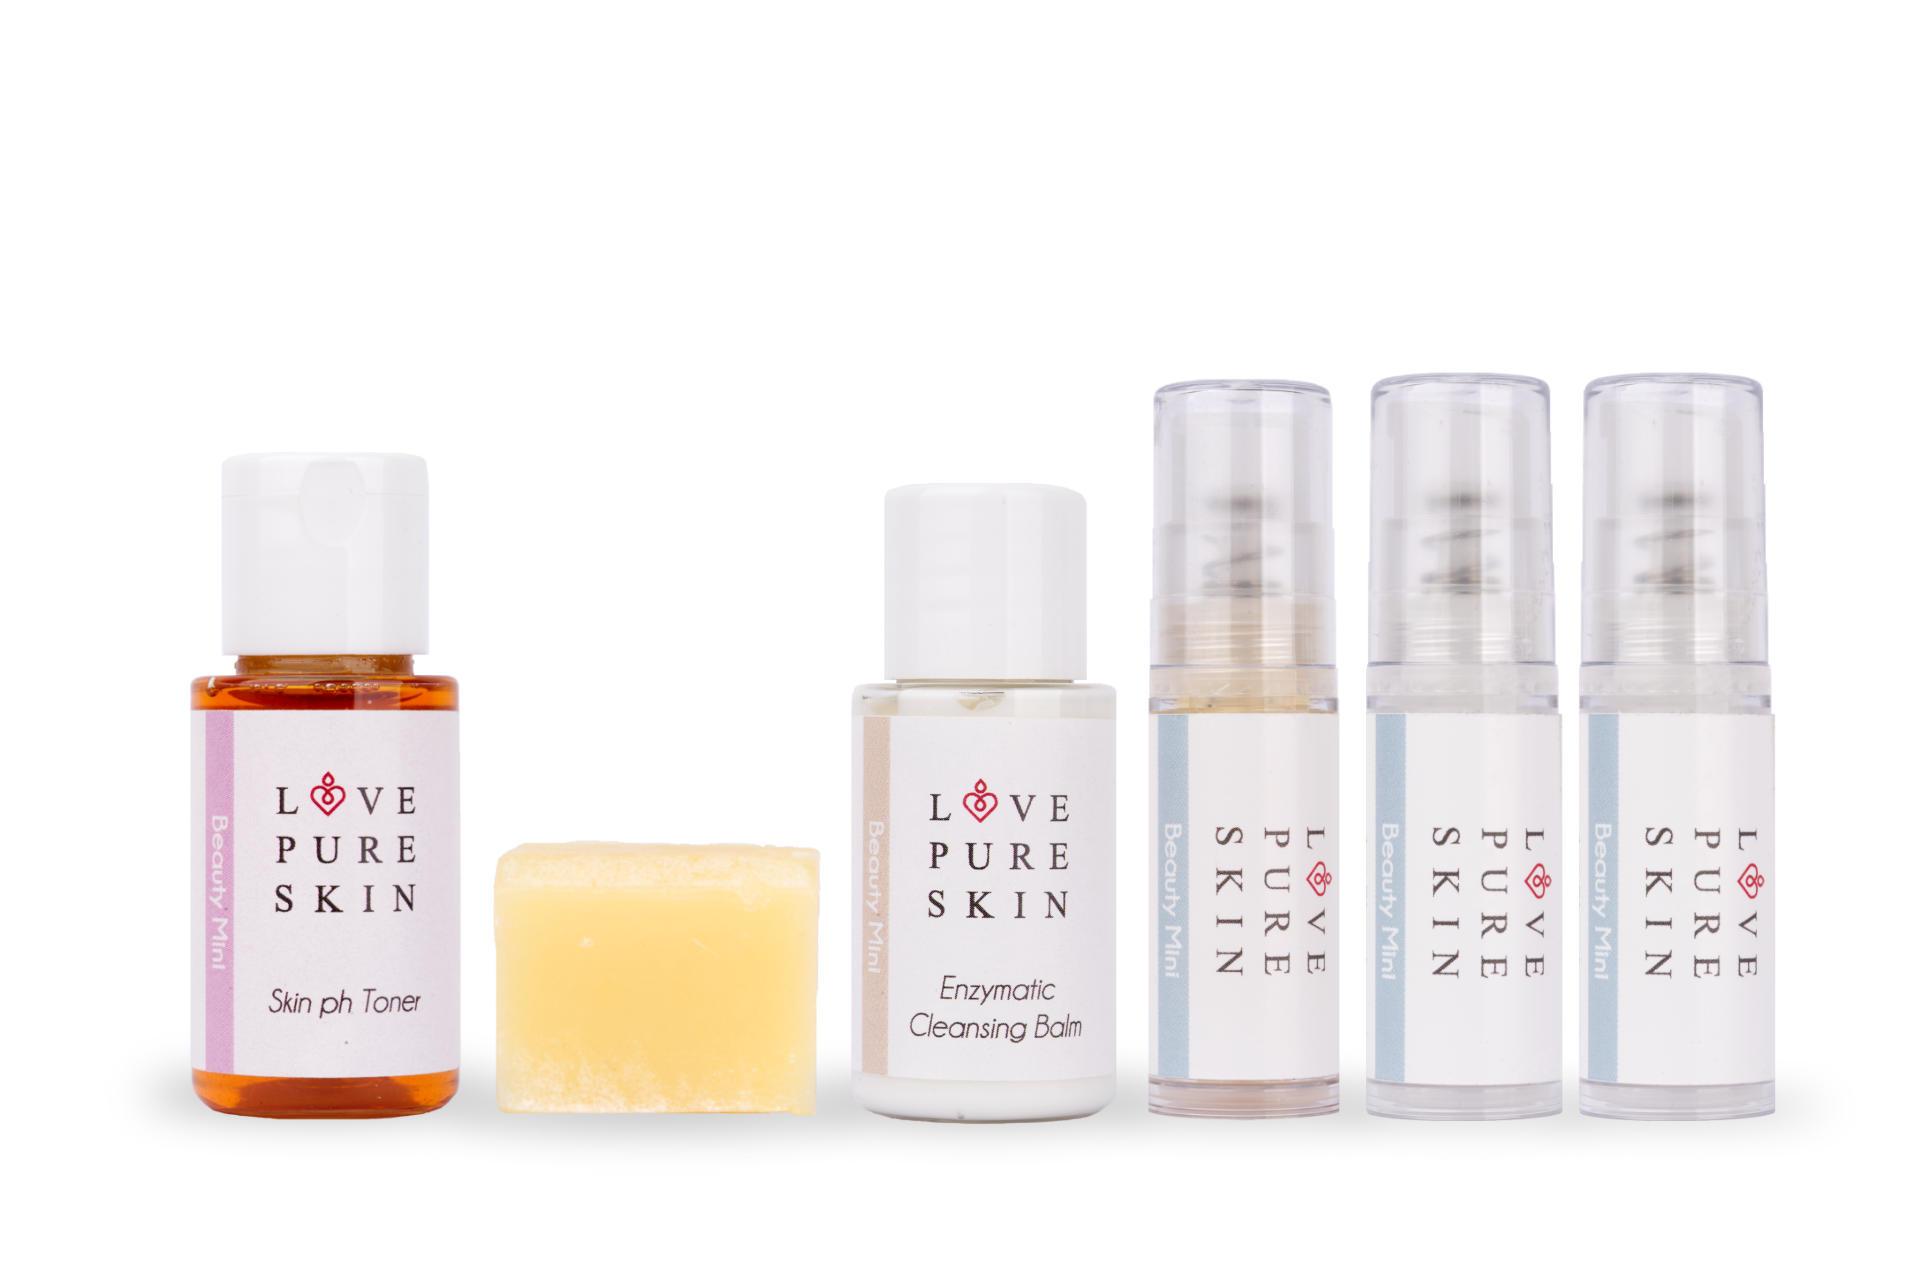 LOVE PURE SKIN Beauty Mini-Set 3 für trockene unreine Haut